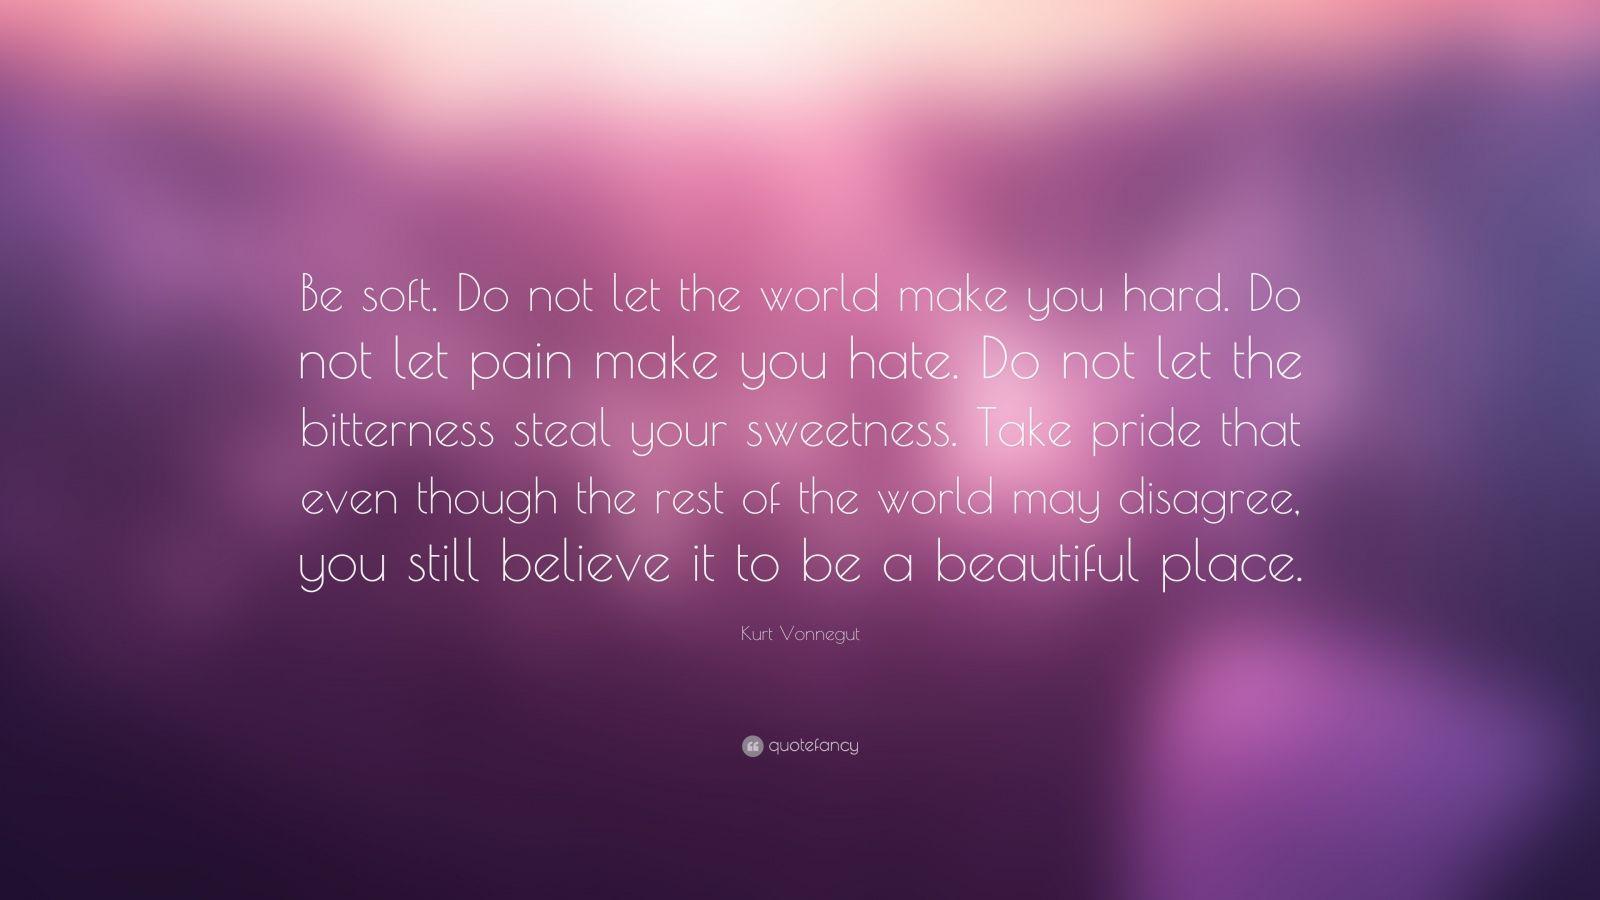 Ernest Hemingway Quote Wallpaper Kurt Vonnegut Quote Be Soft Do Not Let The World Make